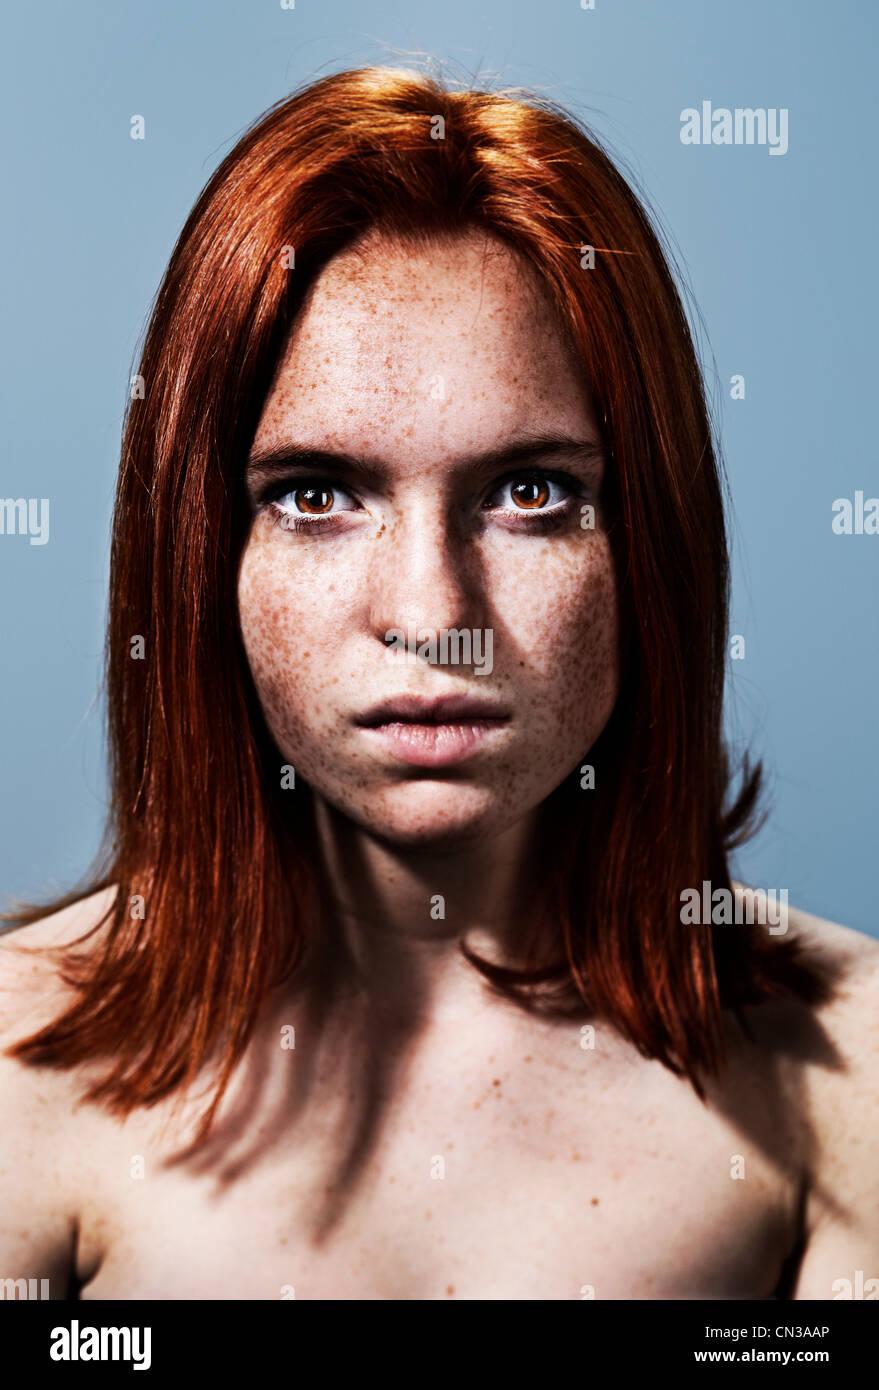 Portrait of teenage girl looking intense - Stock Image